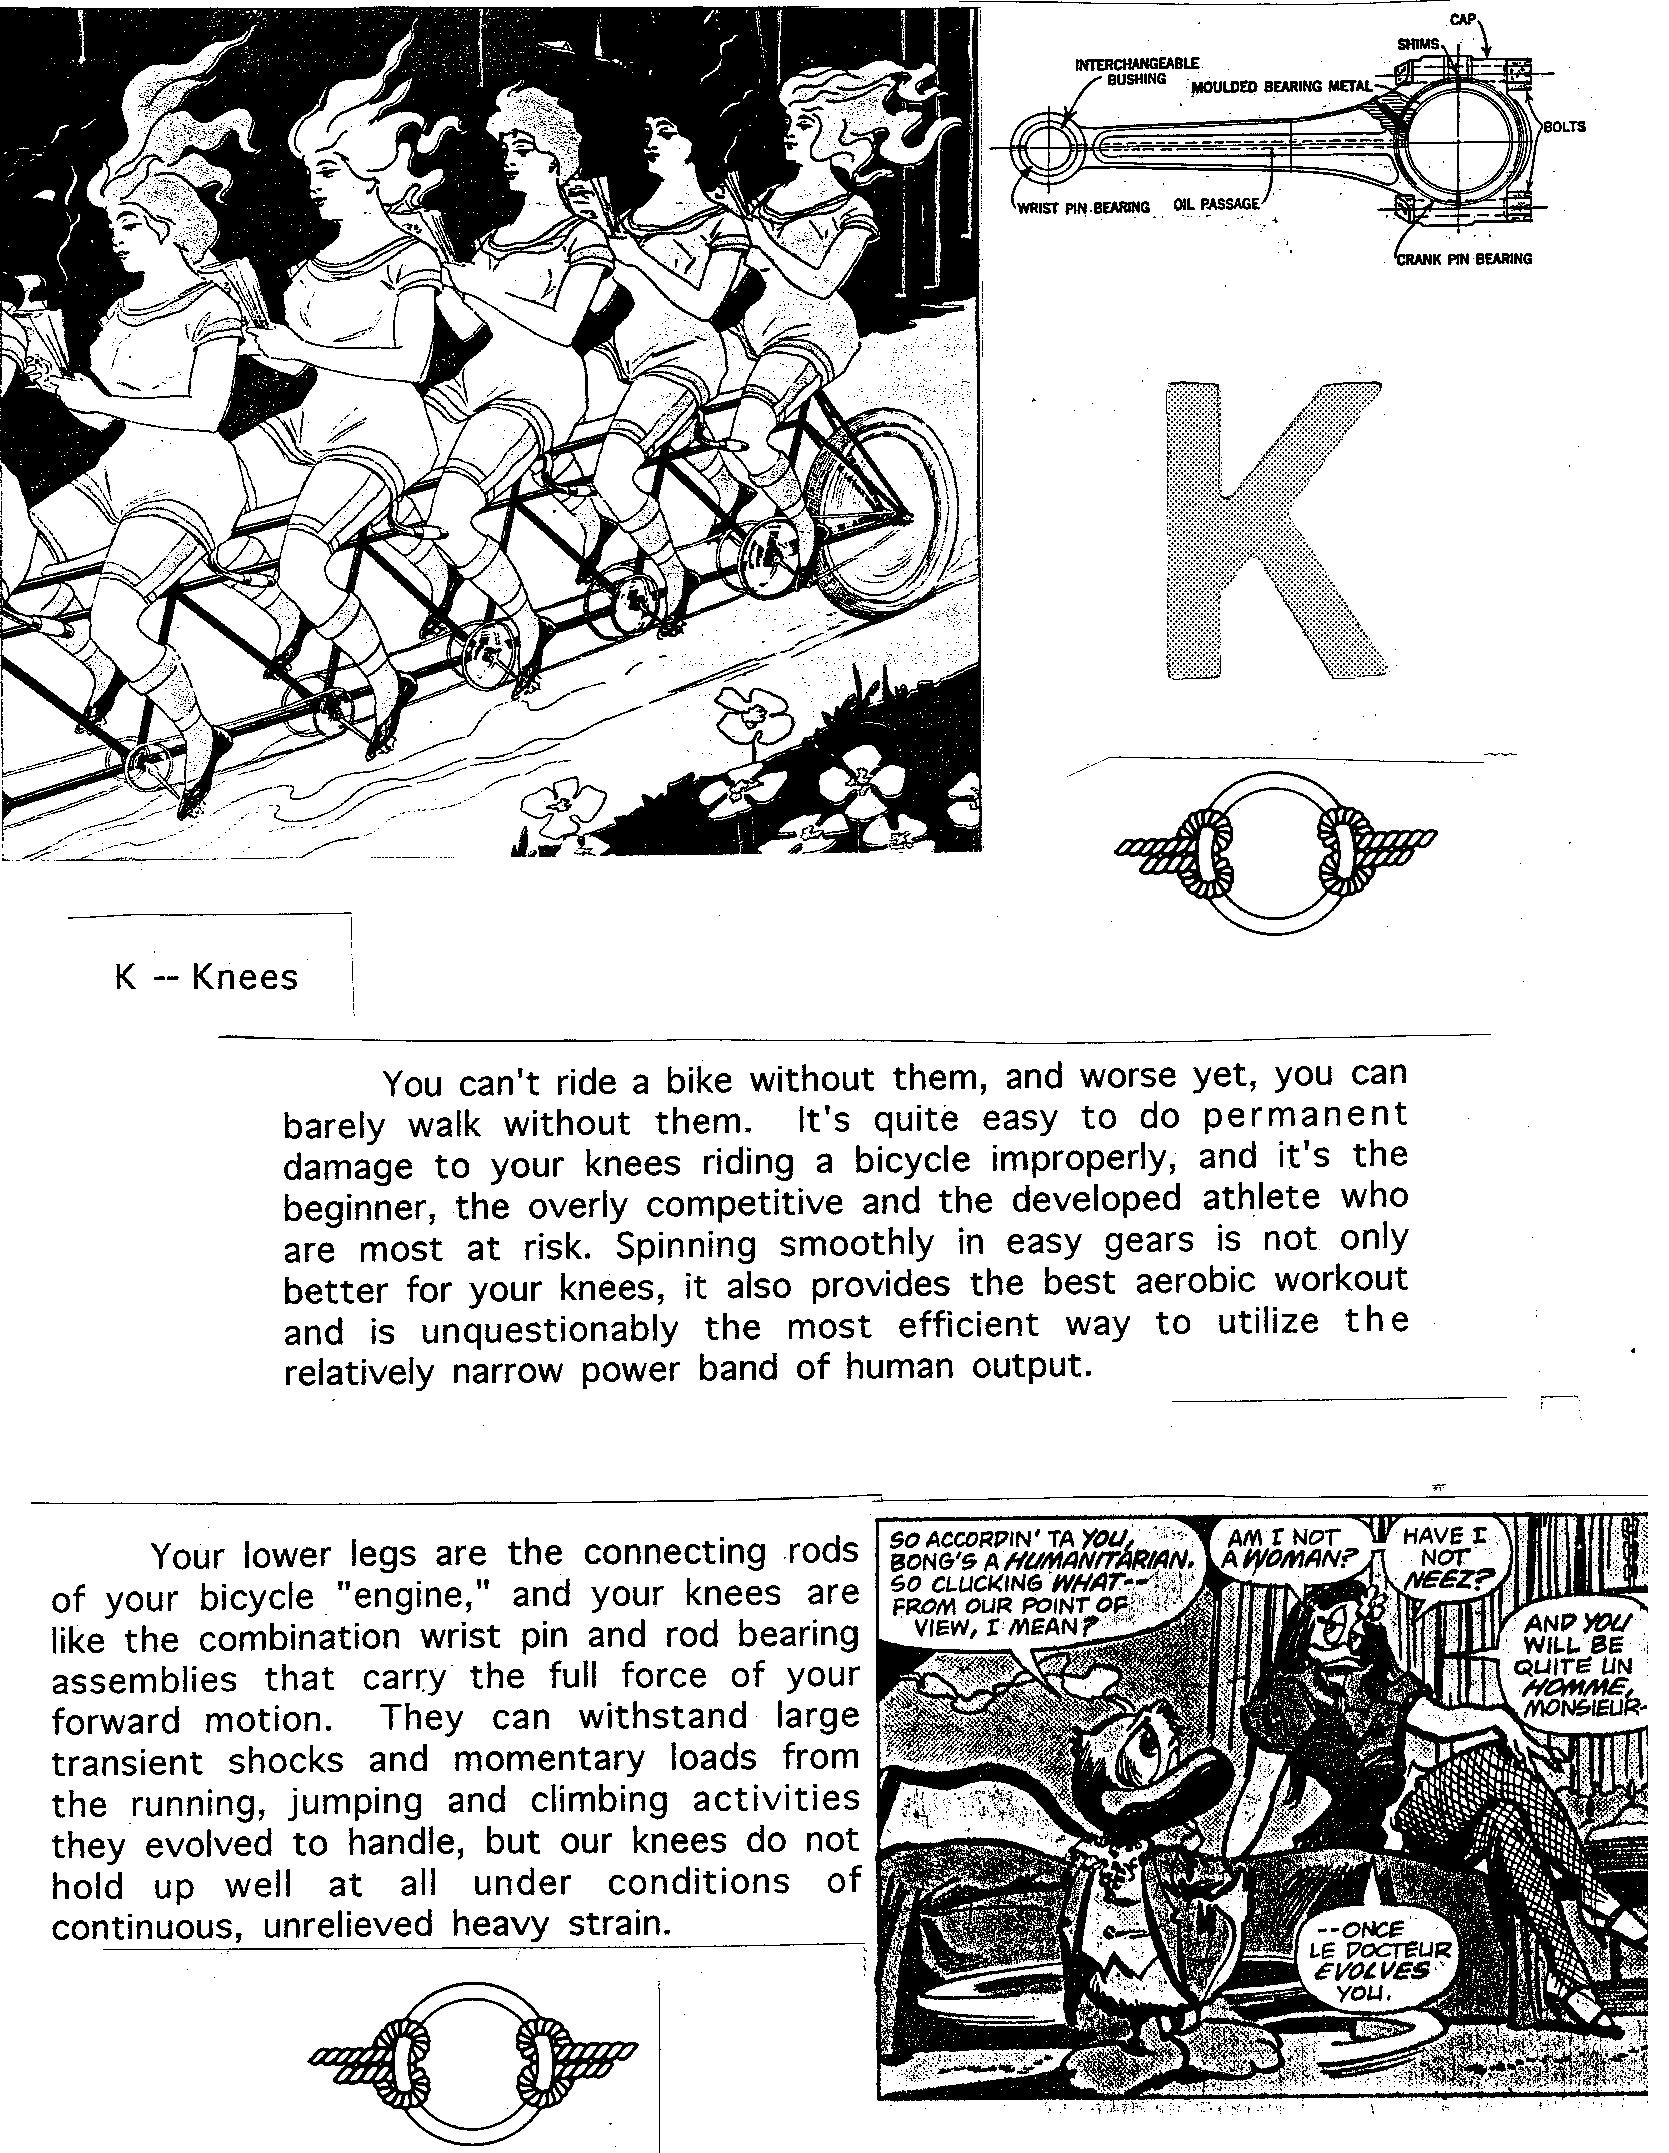 14 Compton Bicycle ABC - K1.jpg